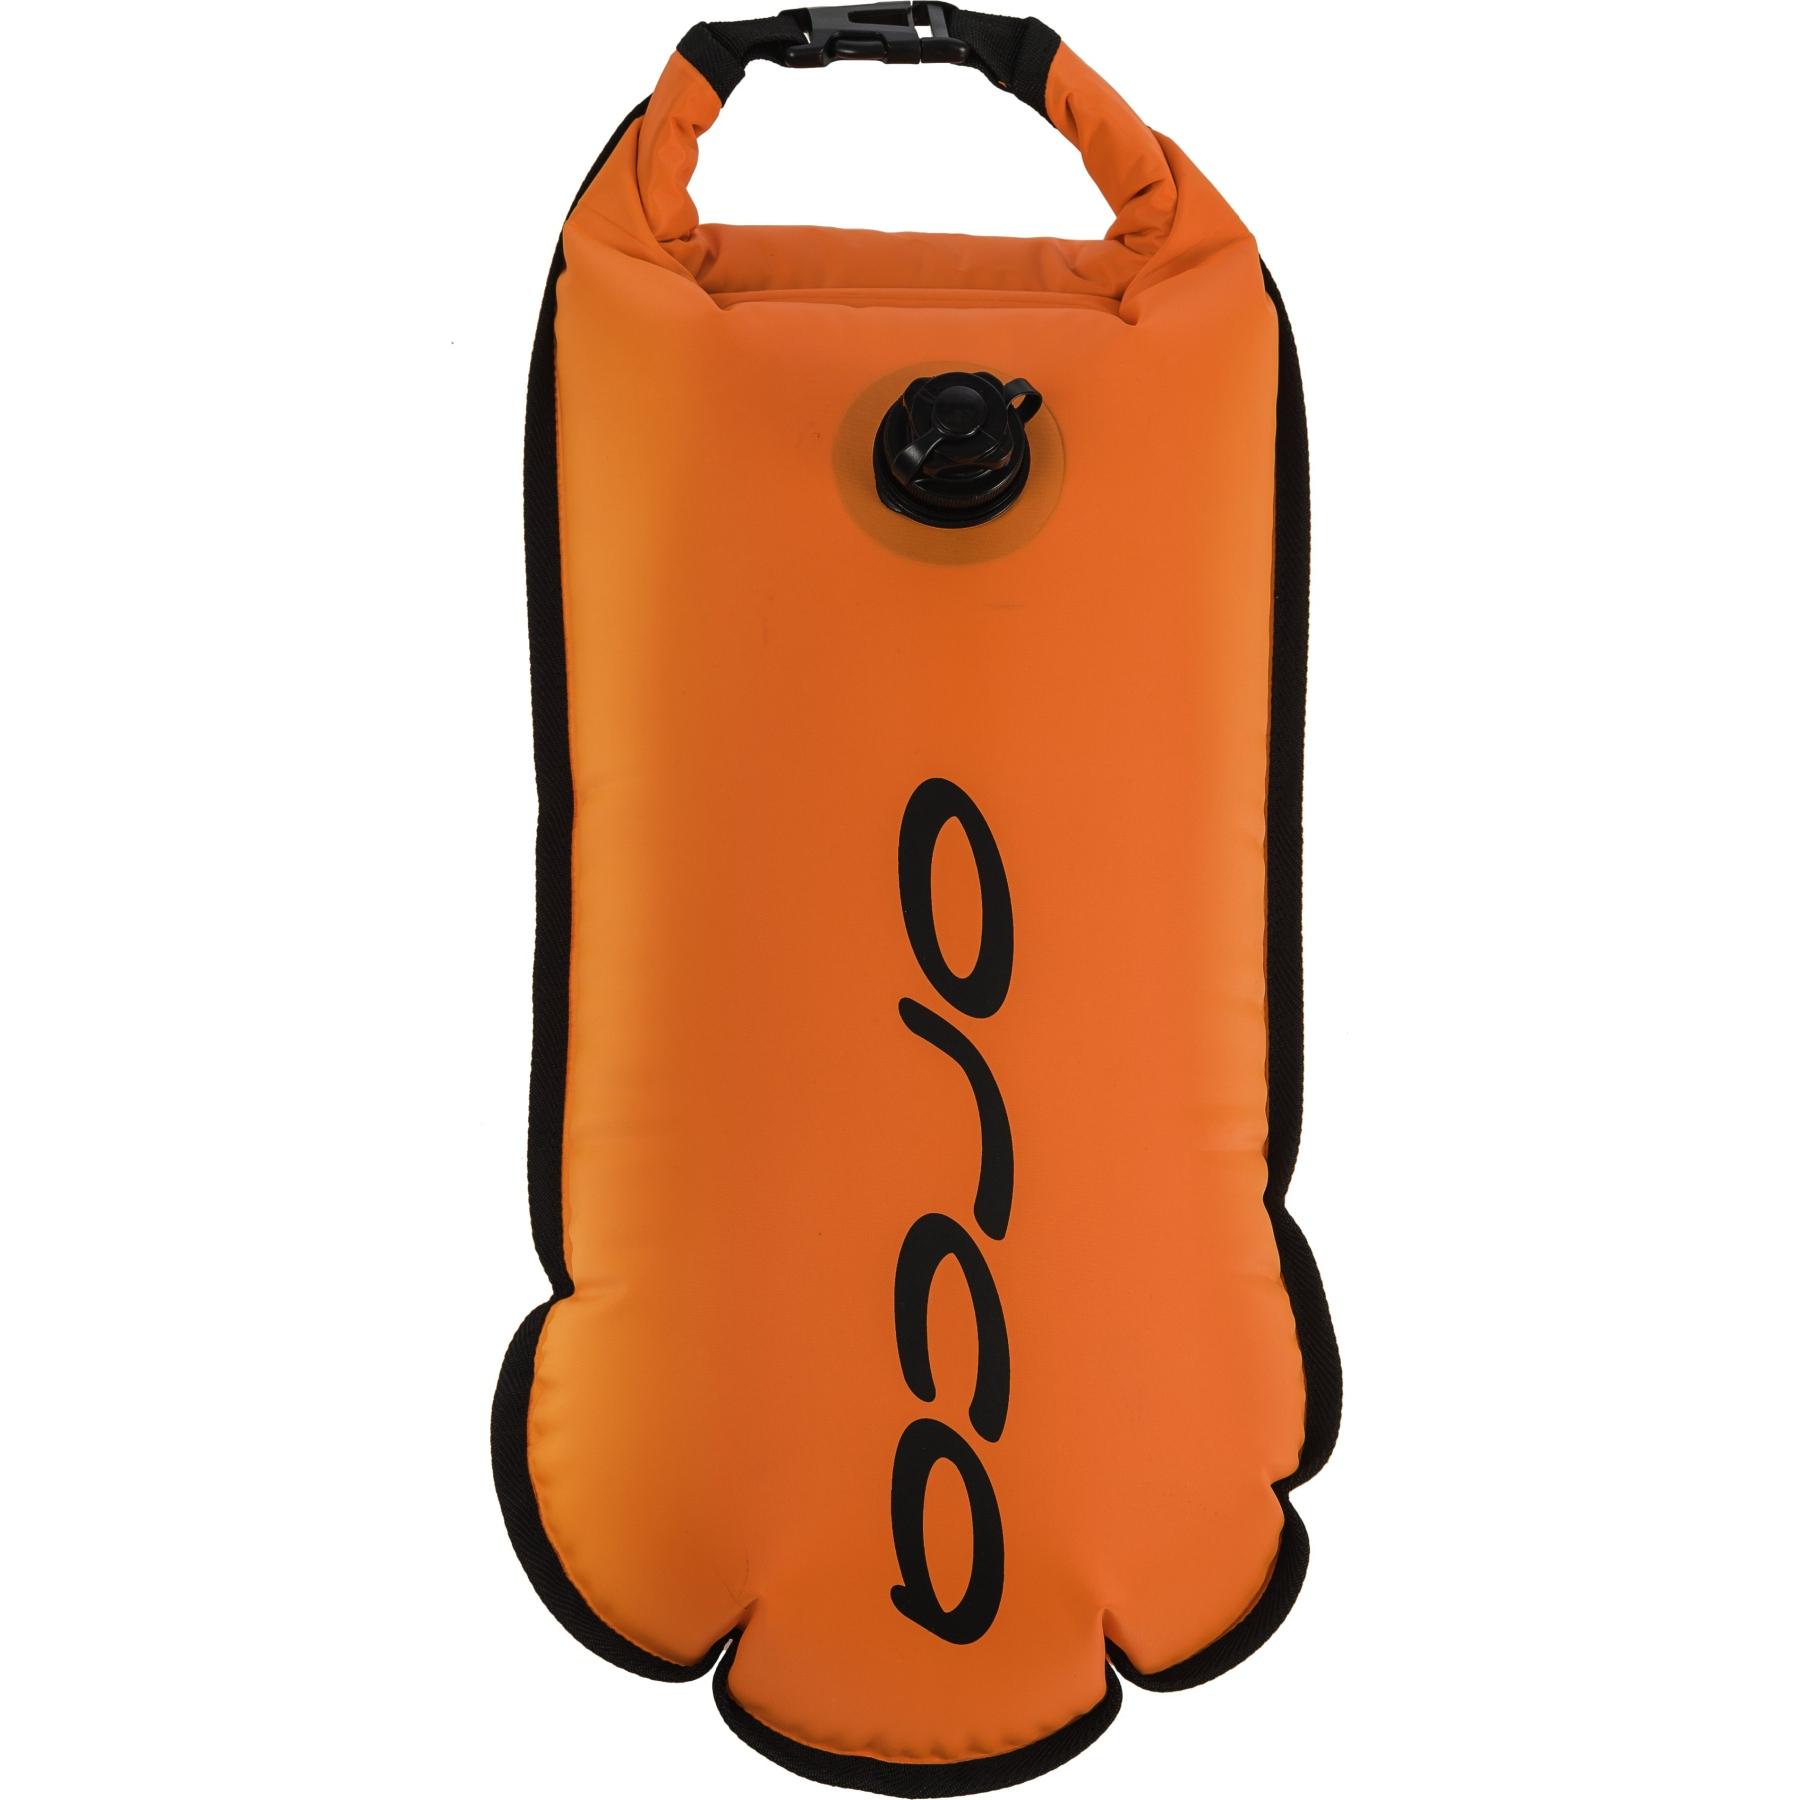 Orca Safety Buoy Sicherheitsboje - high vis orange